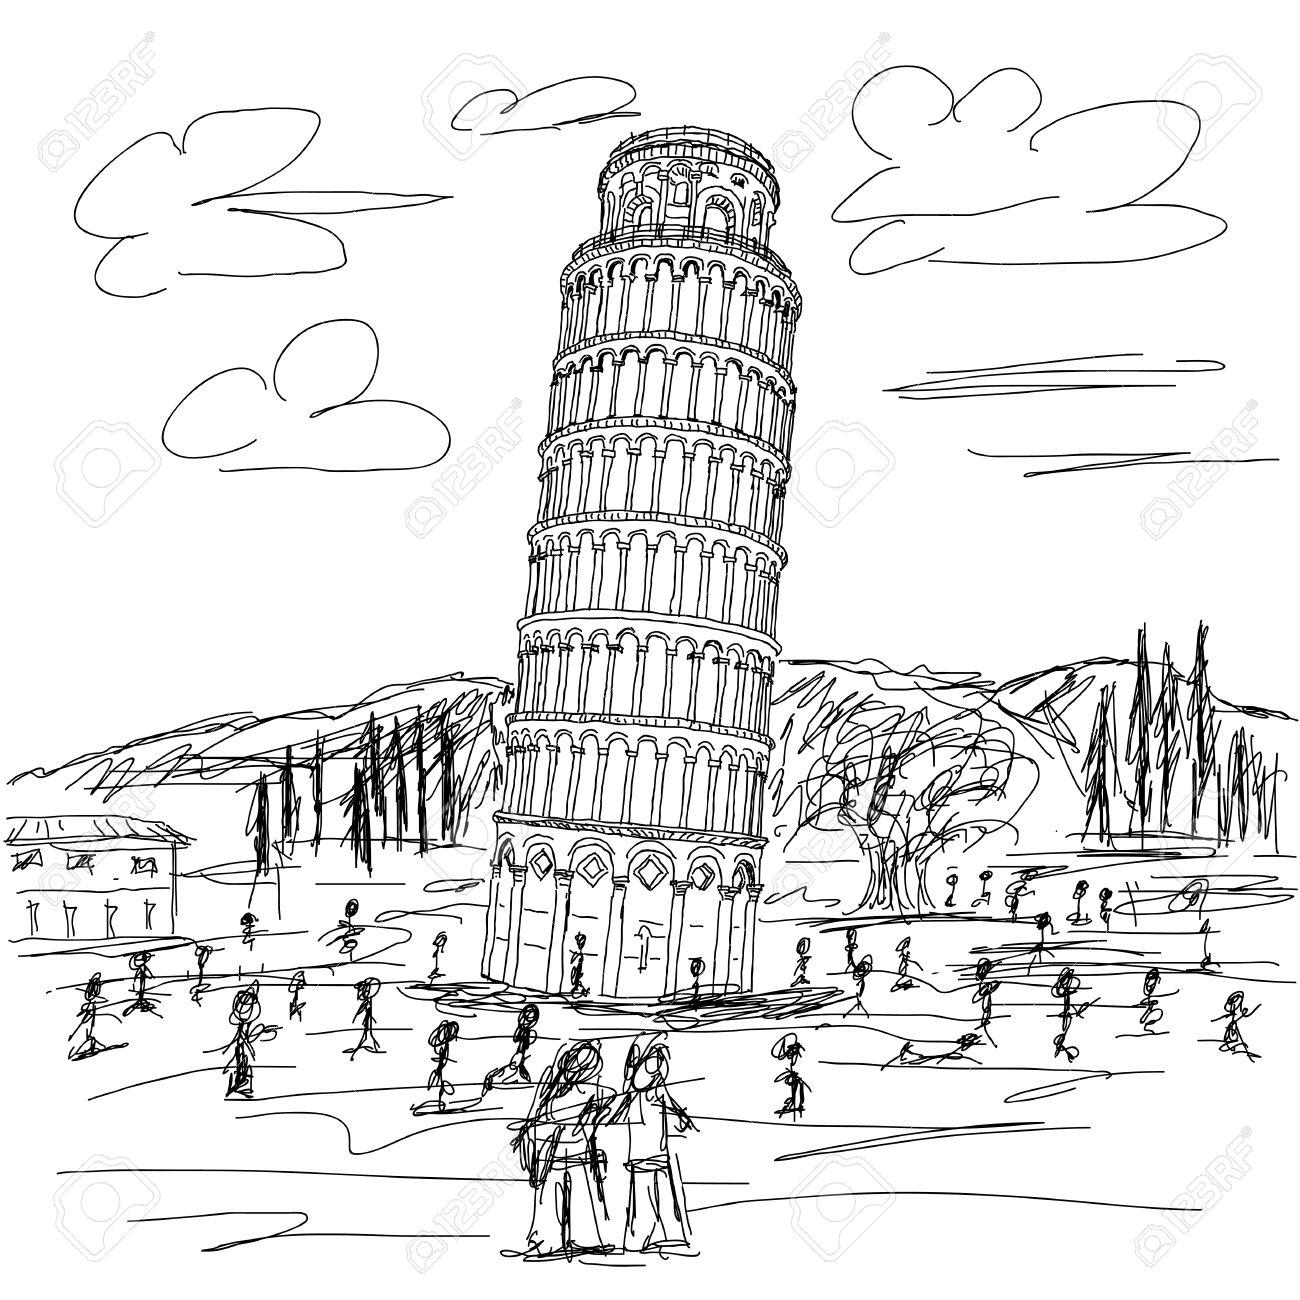 1300x1300 Hand Drawn Illustration Of Famous Tourist Destination Leaning